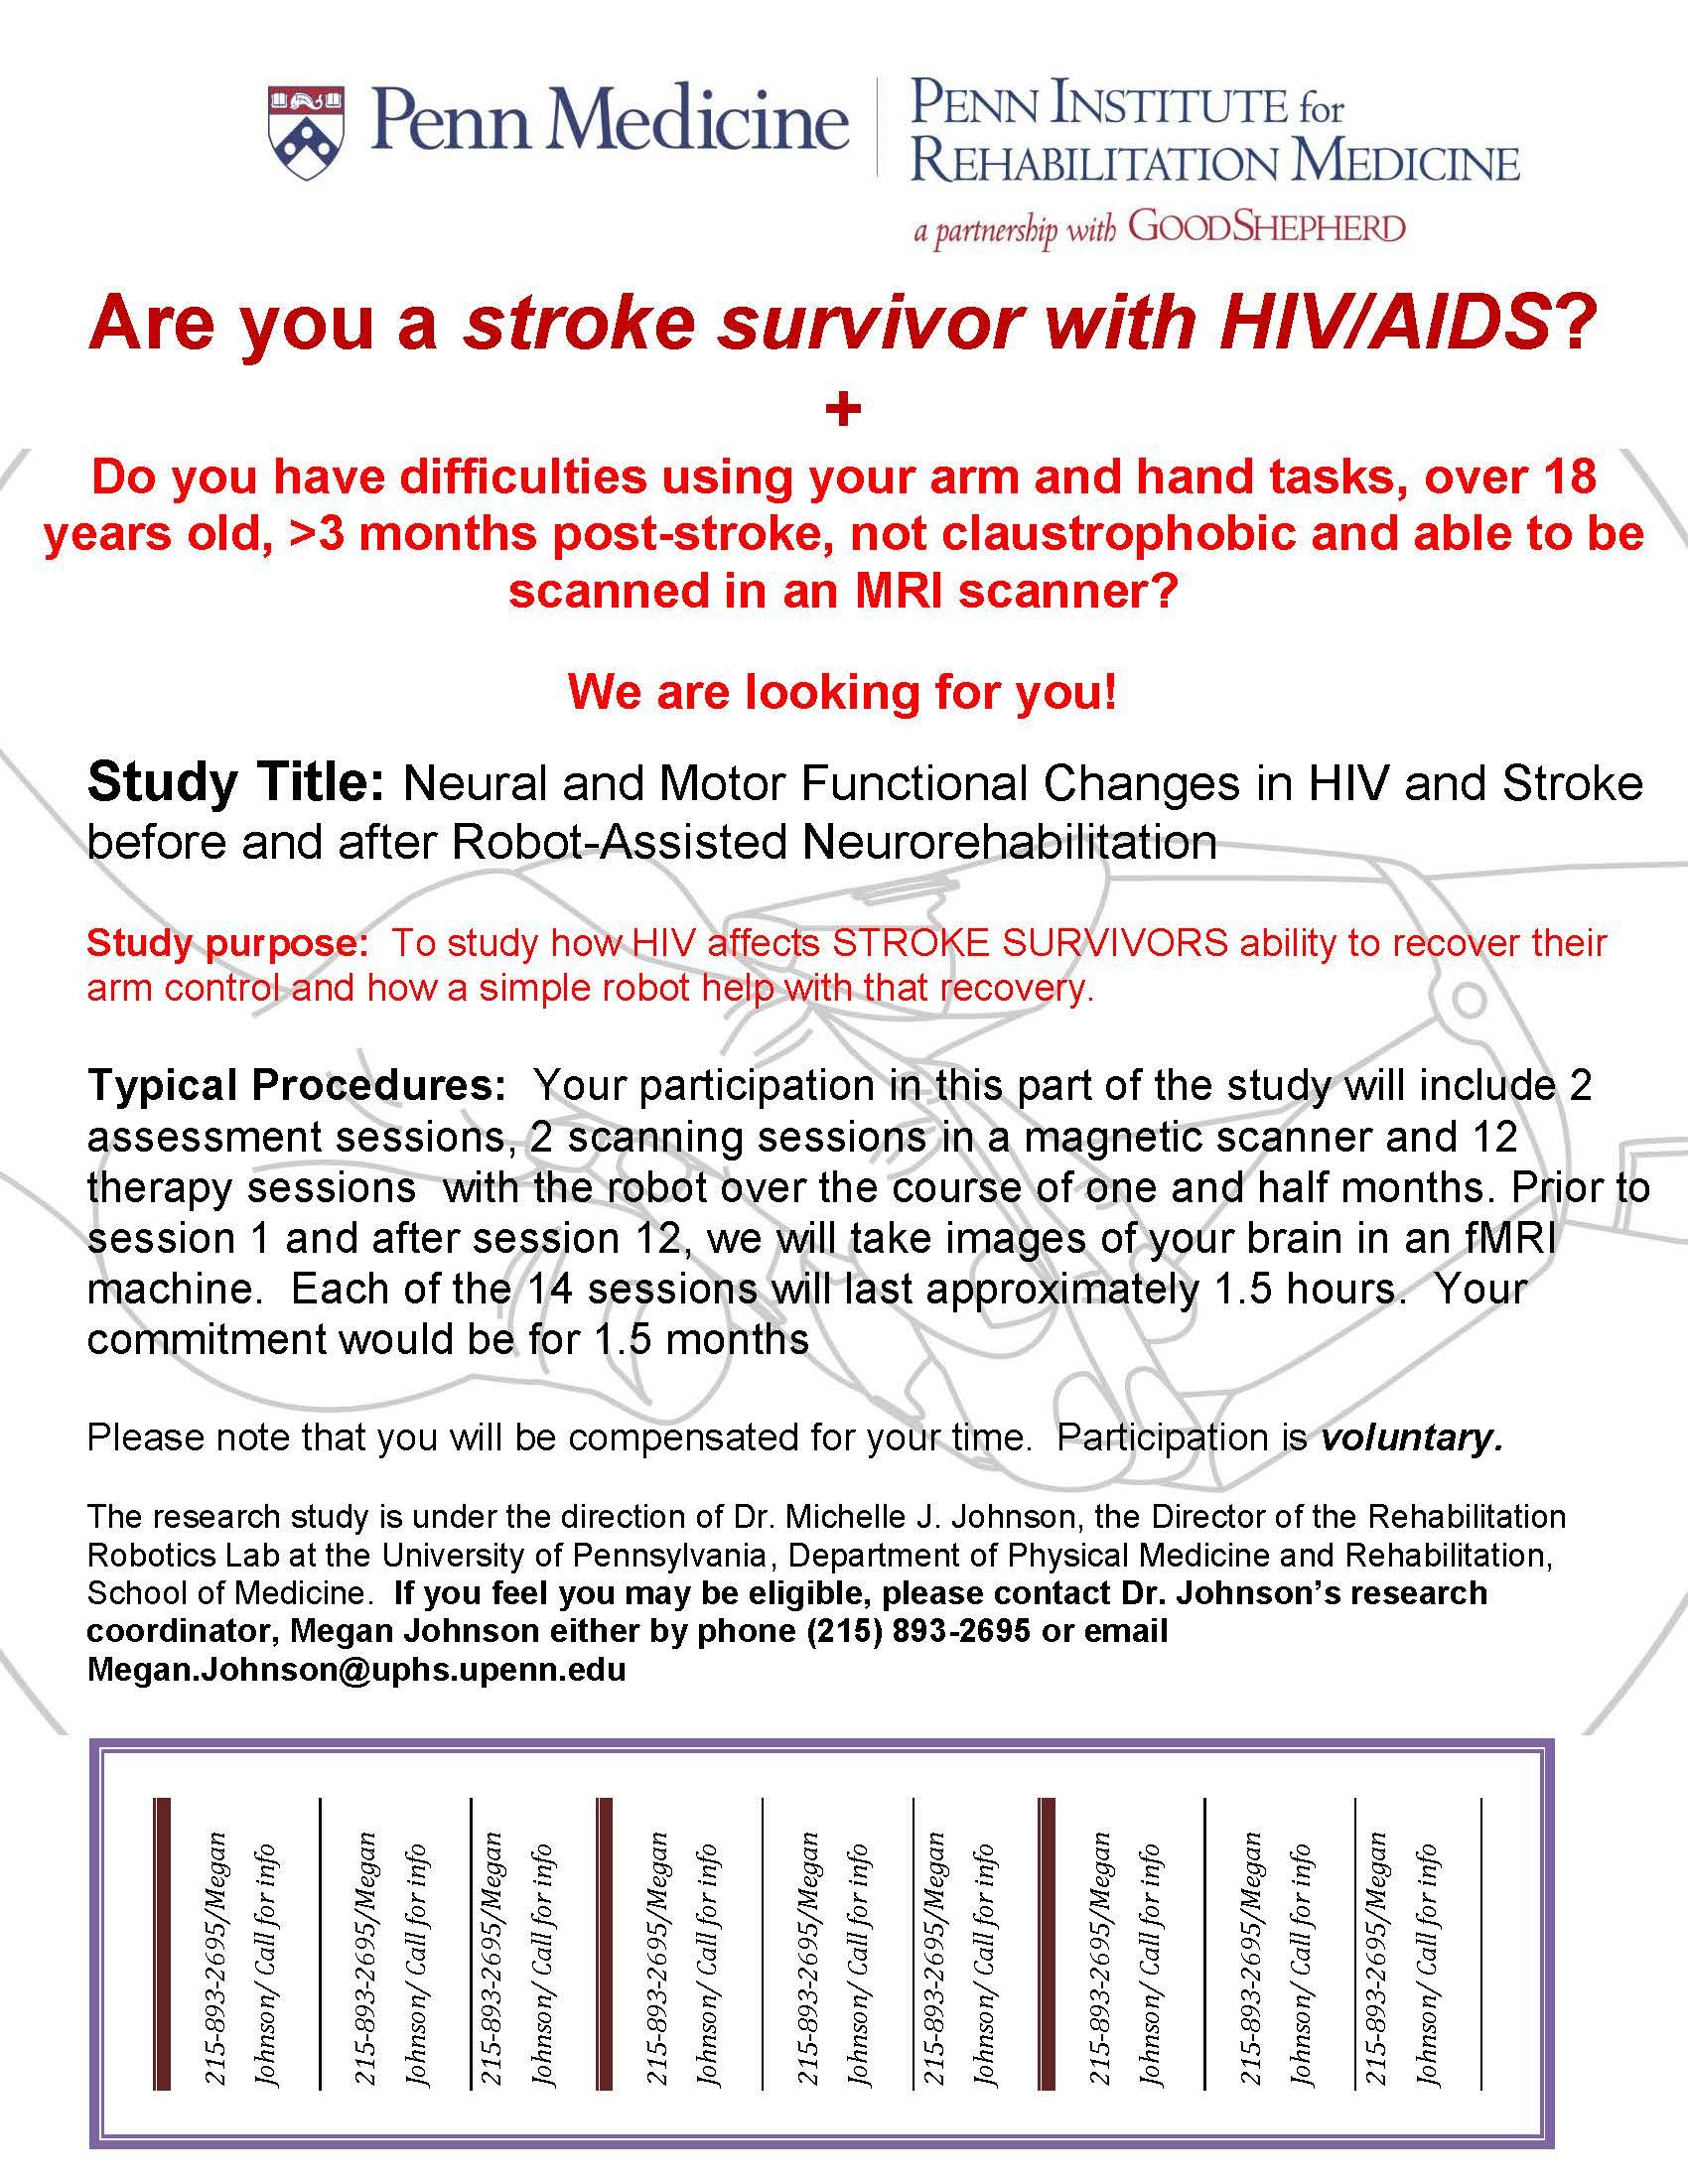 Philadelphia HIV/AIDS Research Bulletin Board